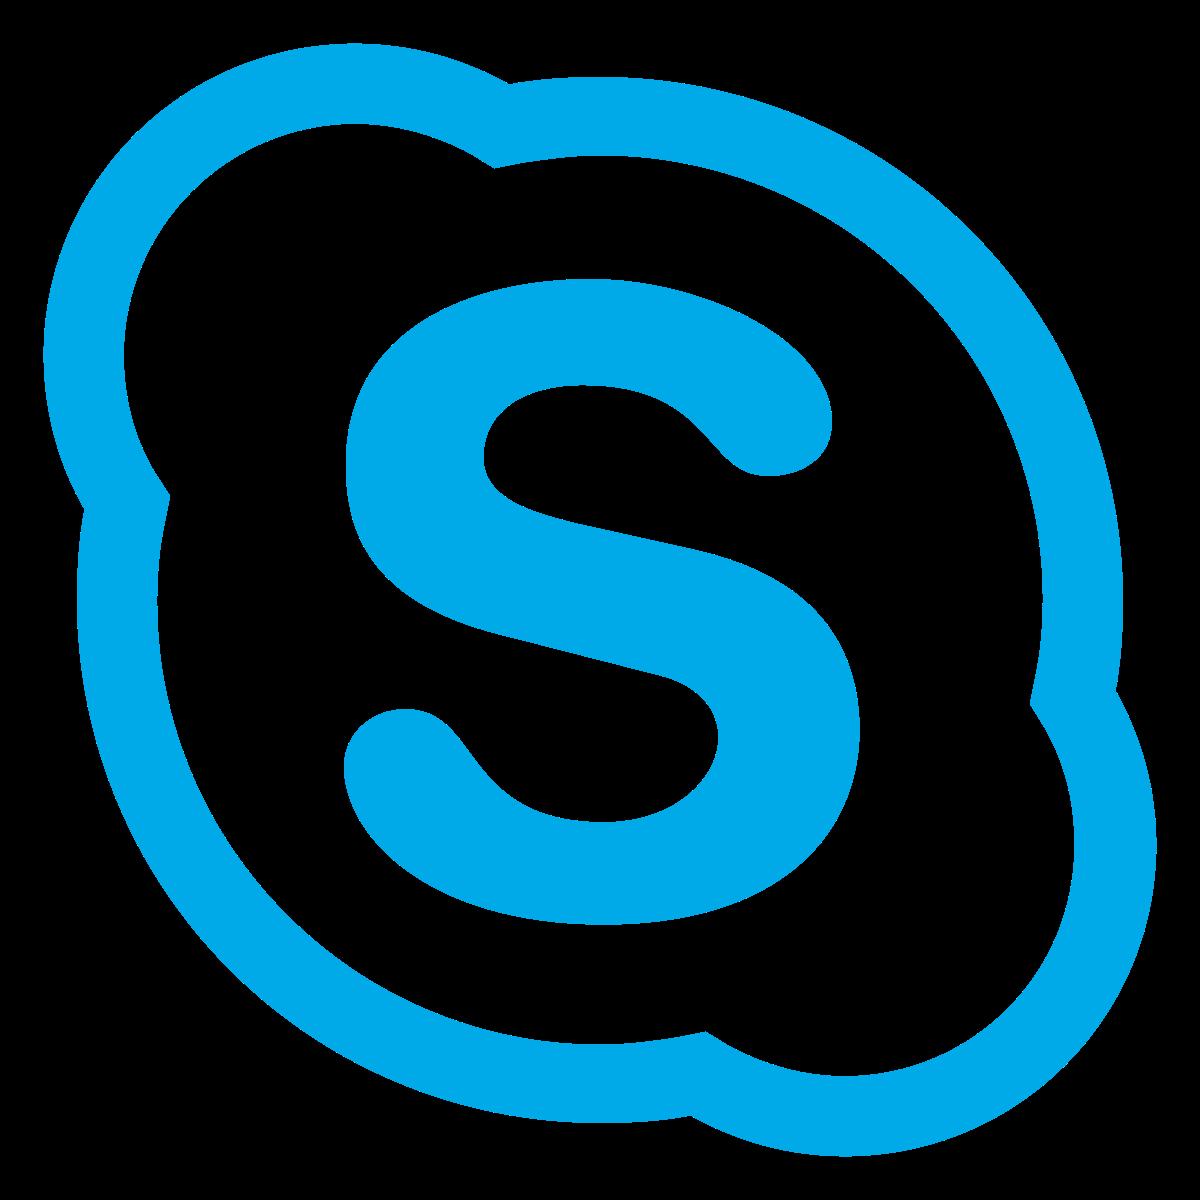 Microsoft clipart publisher microsoft. Skype for business server